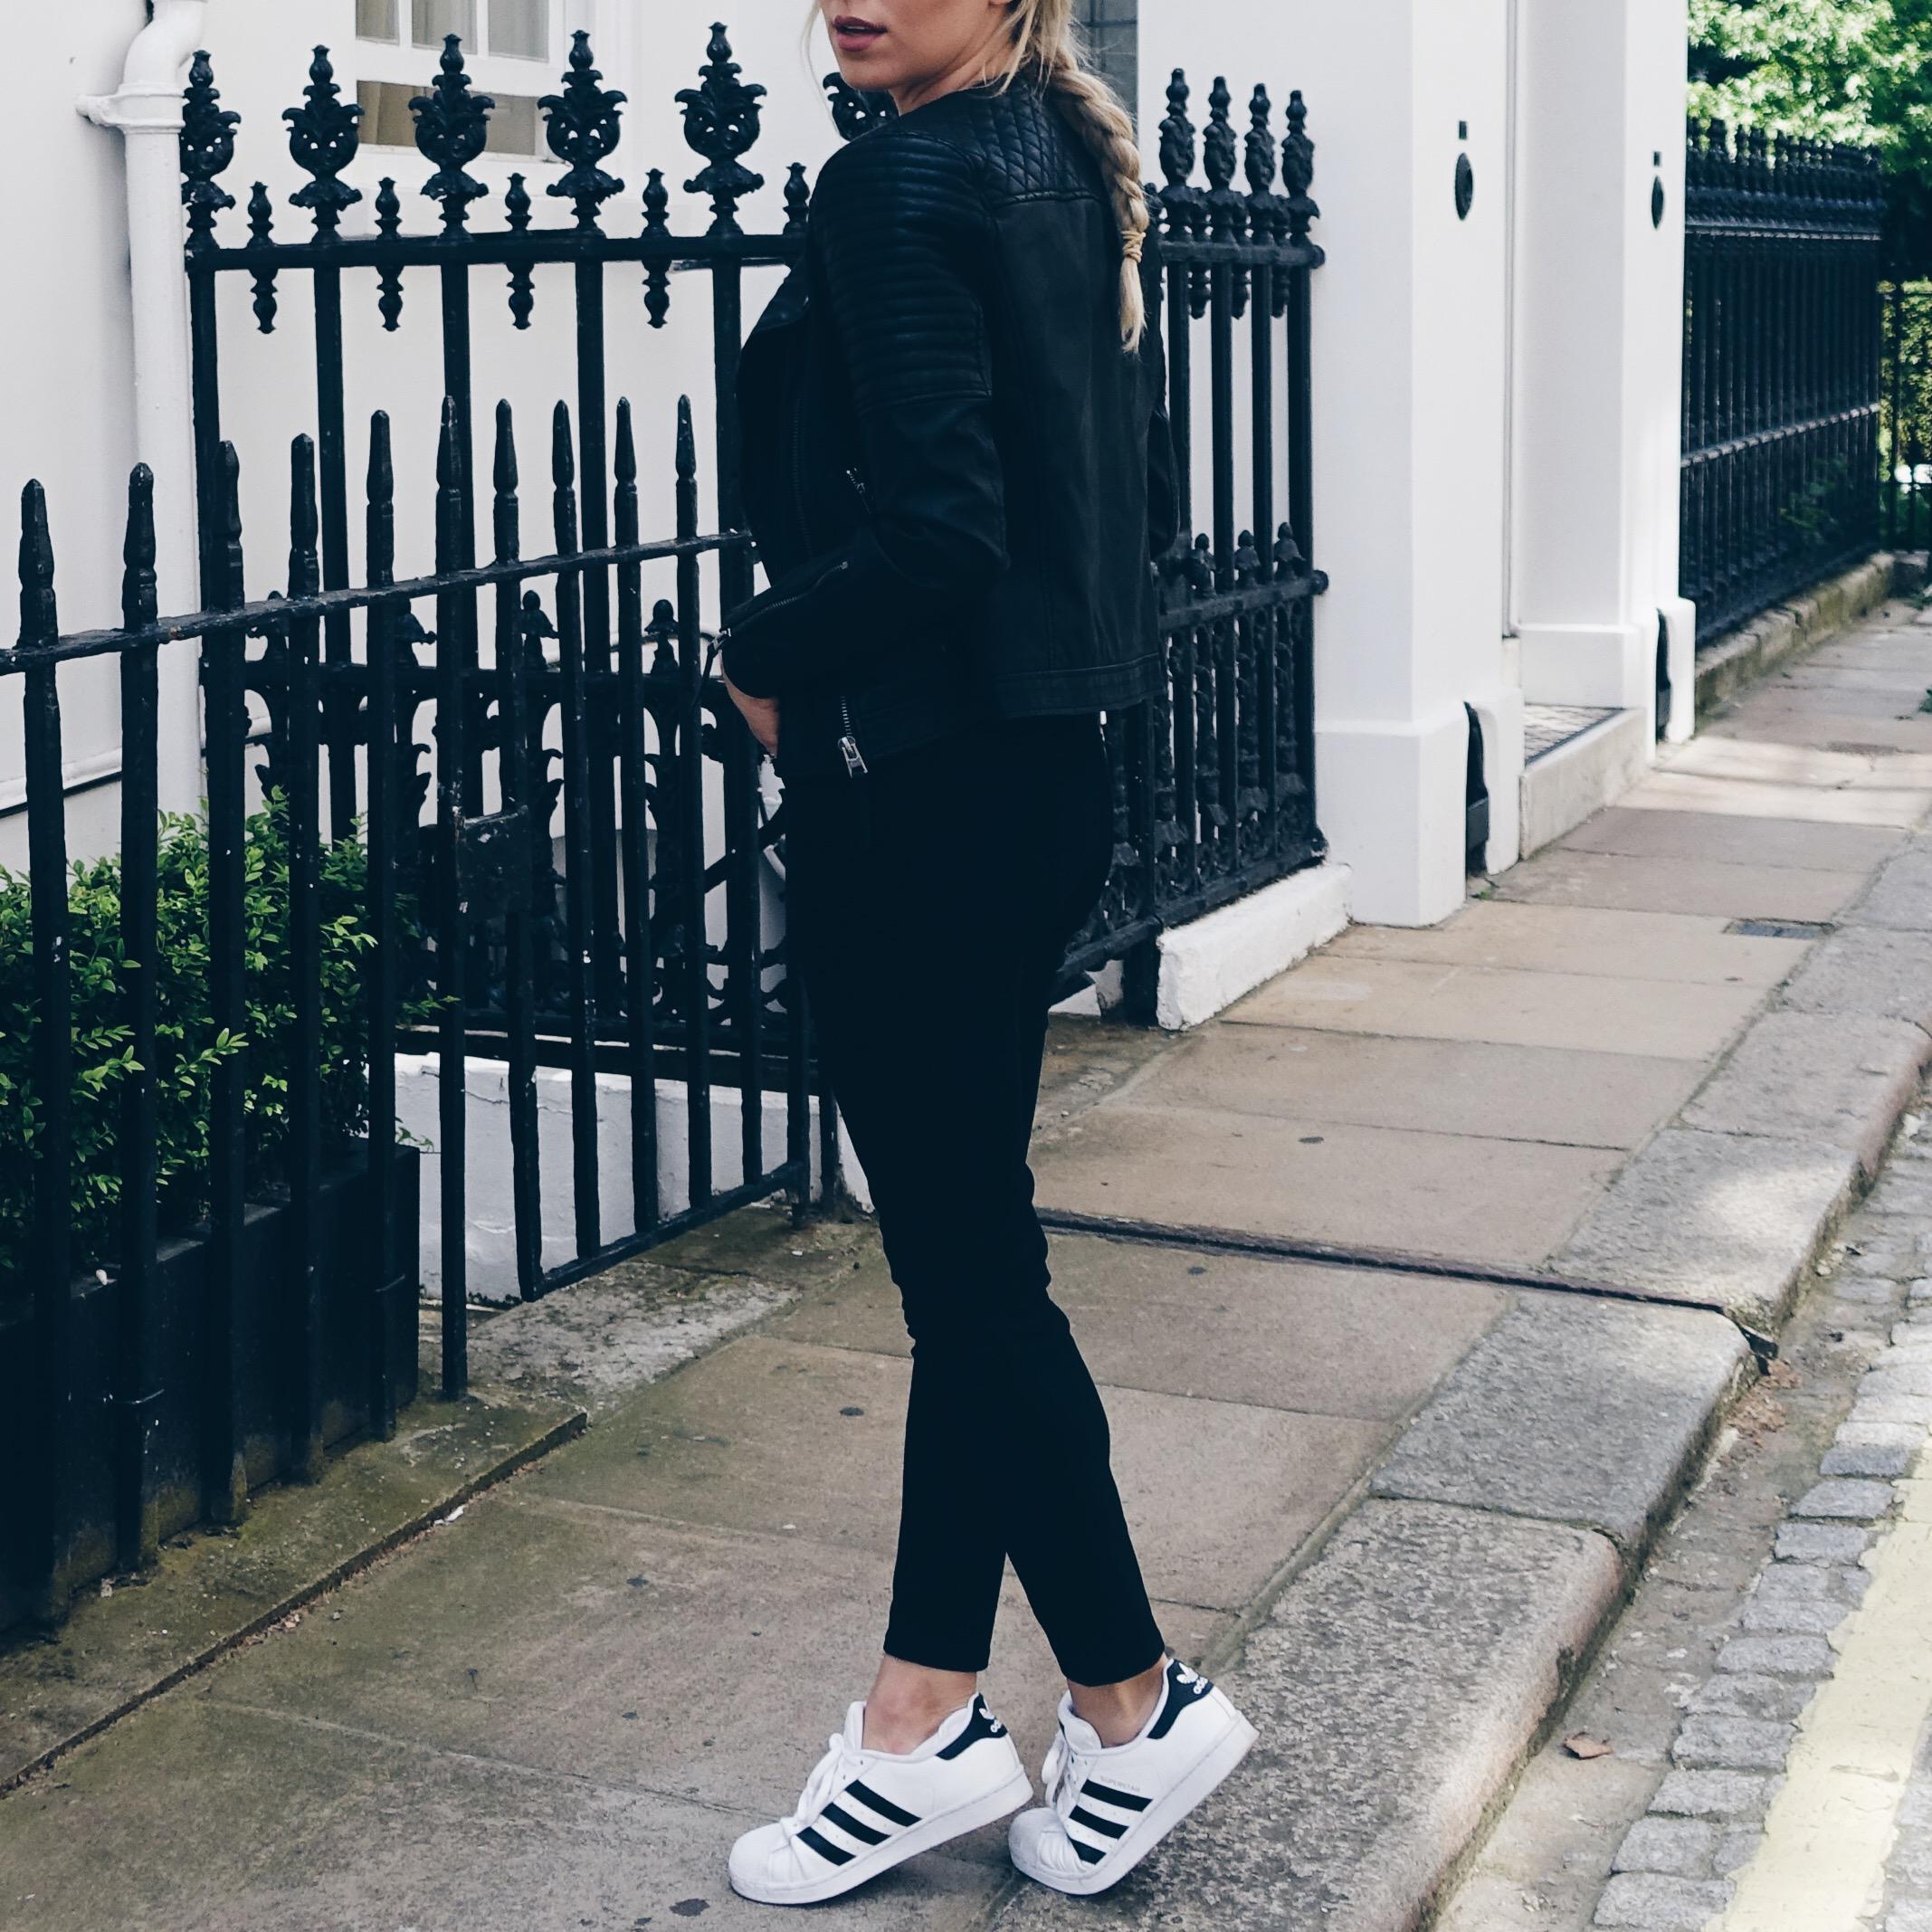 adidas superstar shoes fashion